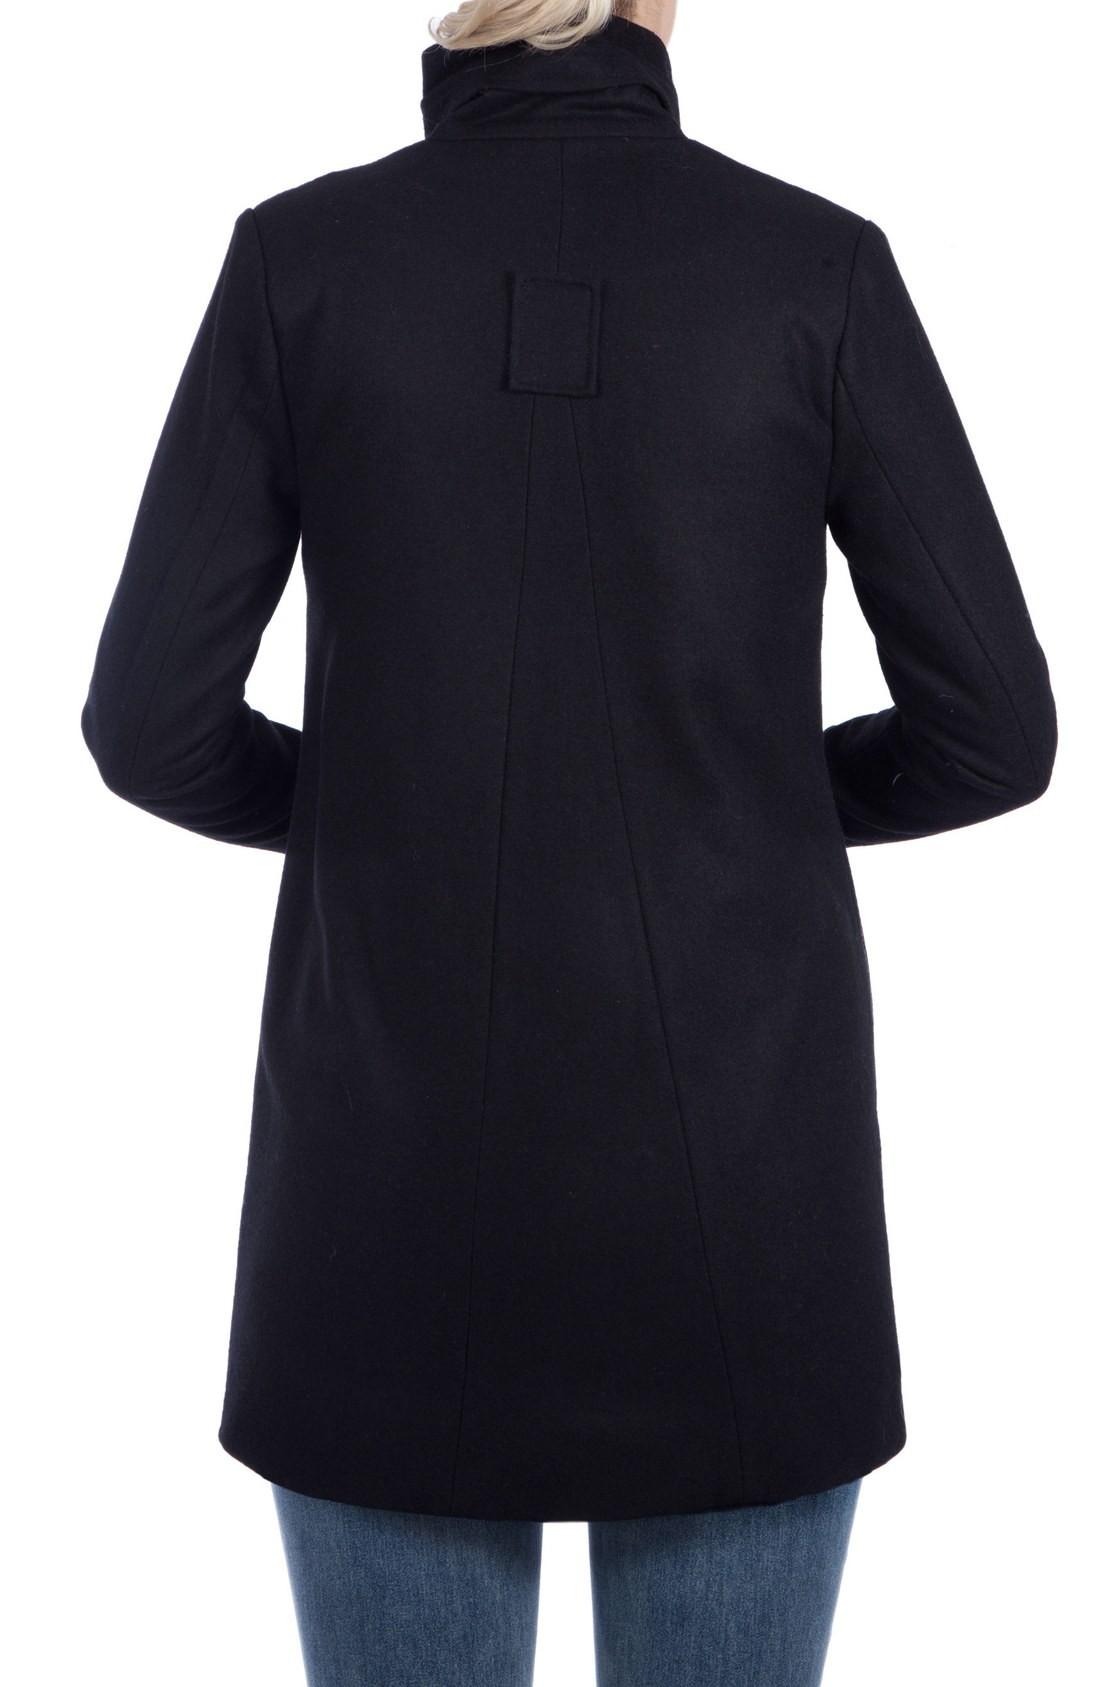 Liz Lange Maternity Jacket | Maternity Jackets | Maternity Underwear Target